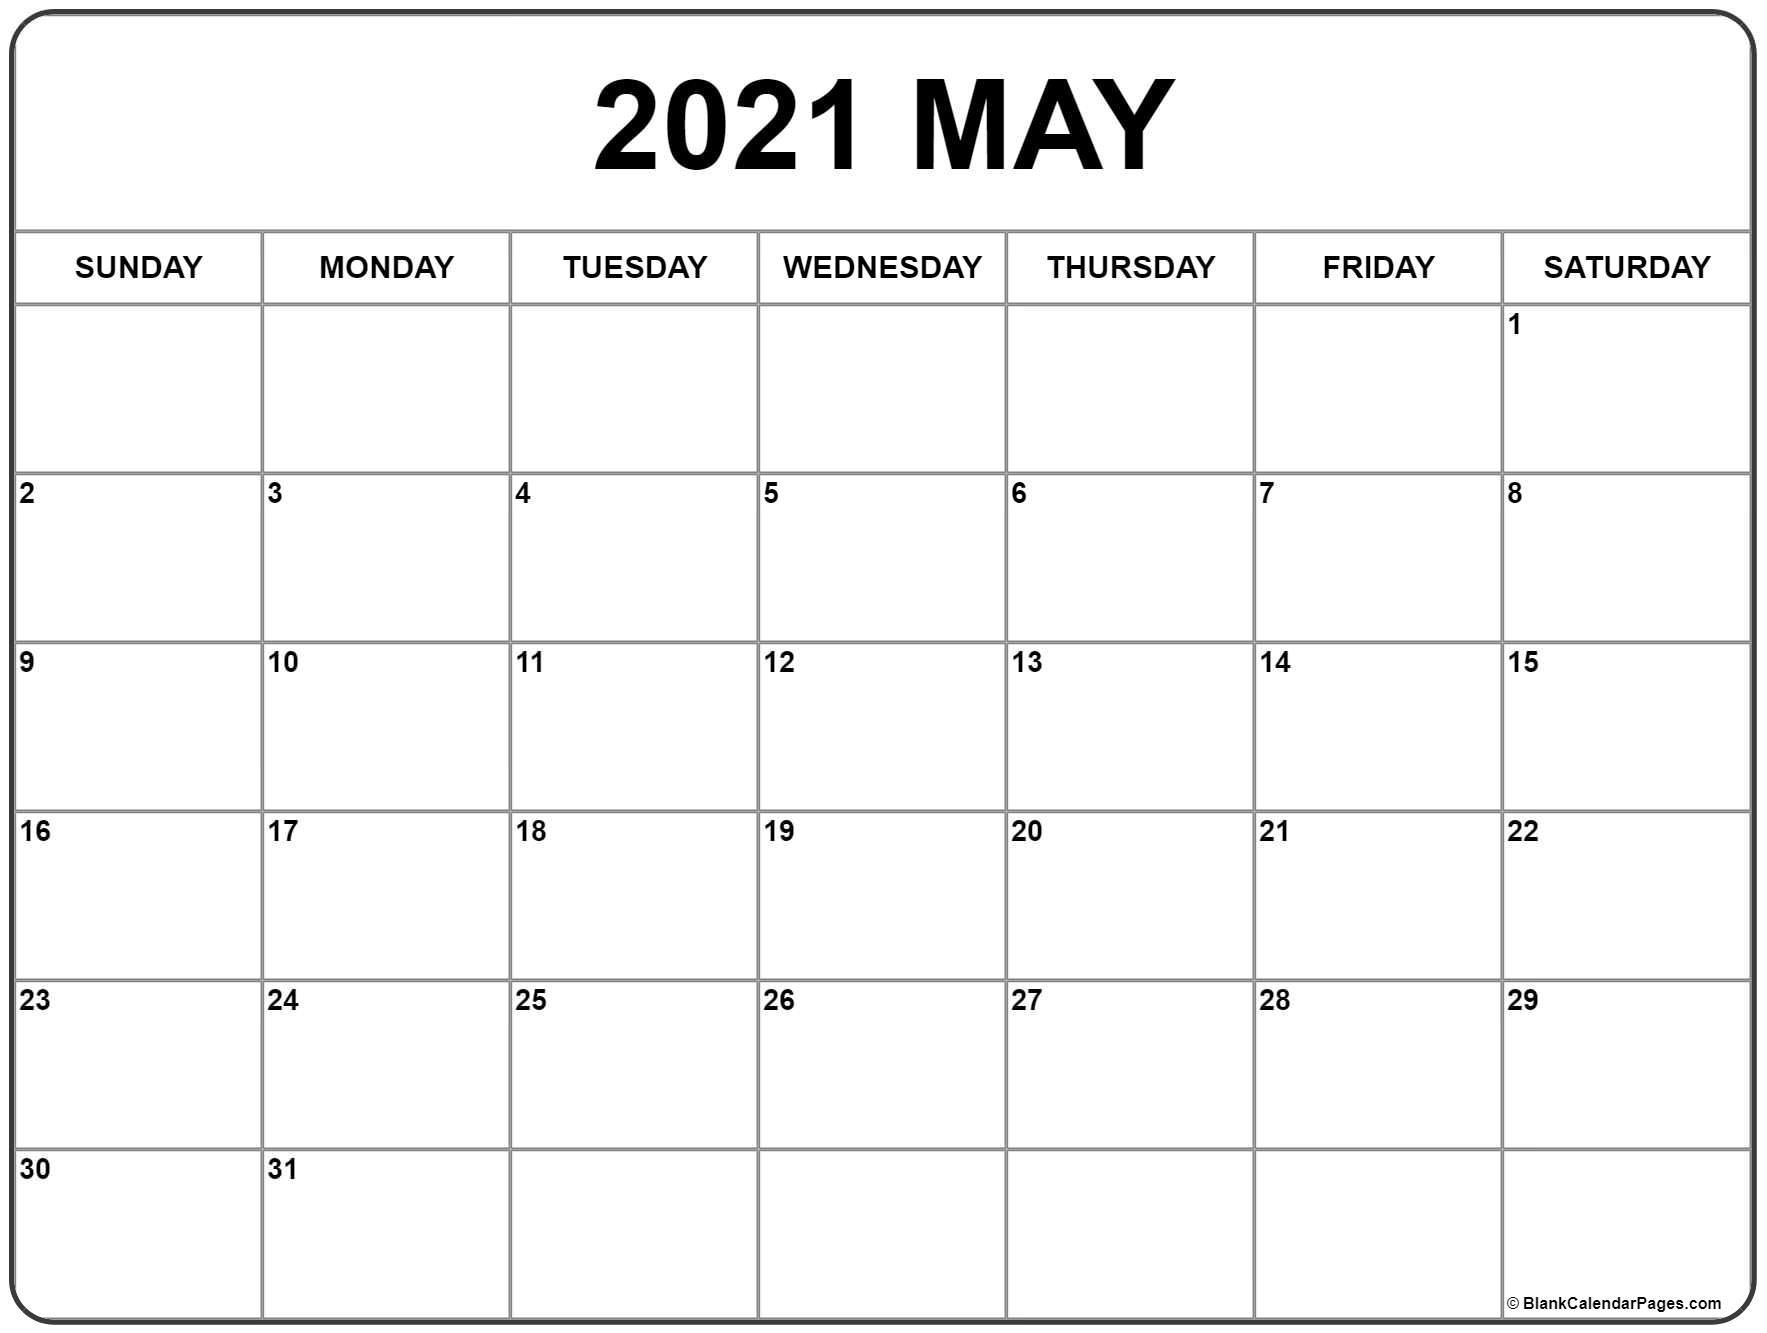 May 2021 Calendar | Free Printable Monthly Calendars  Free Printable 2021 Calendar